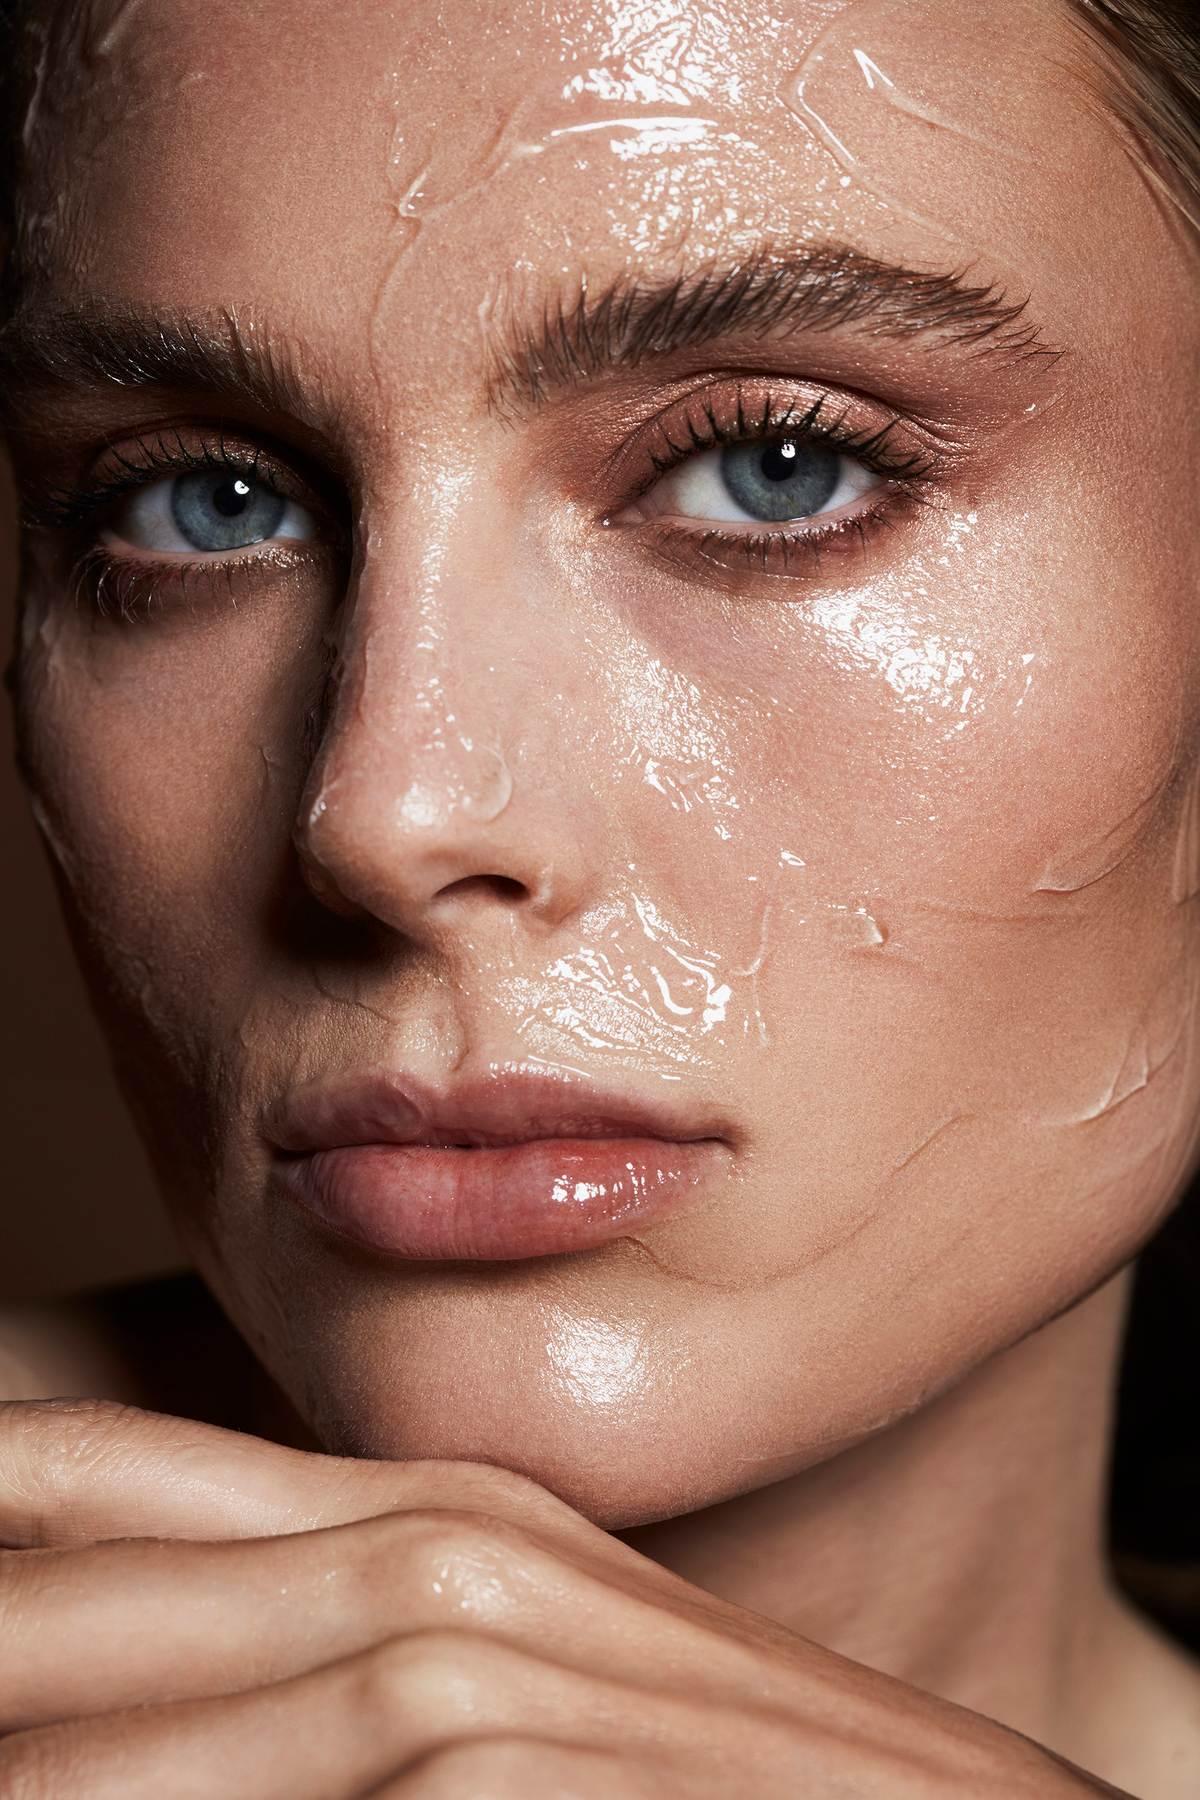 hydration_mask_face_beauty_clean_nomakeup_los_angeles_DT_LB_maggie384_v2.jpg